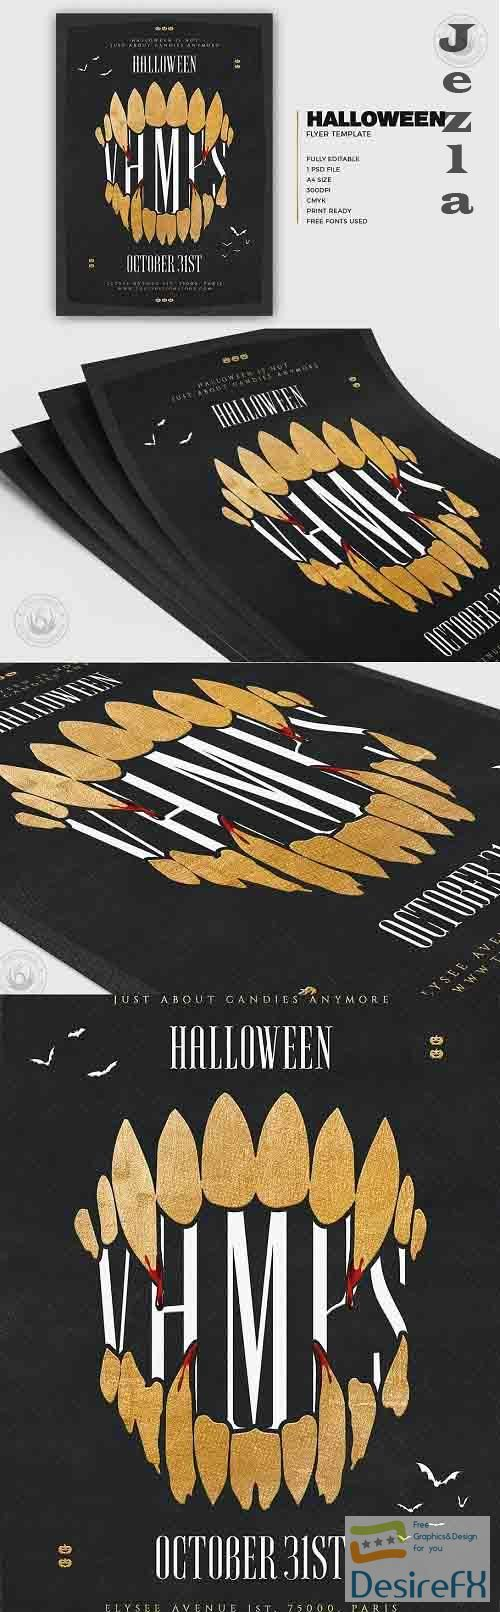 Halloween Flyer Template V28 - 5274284